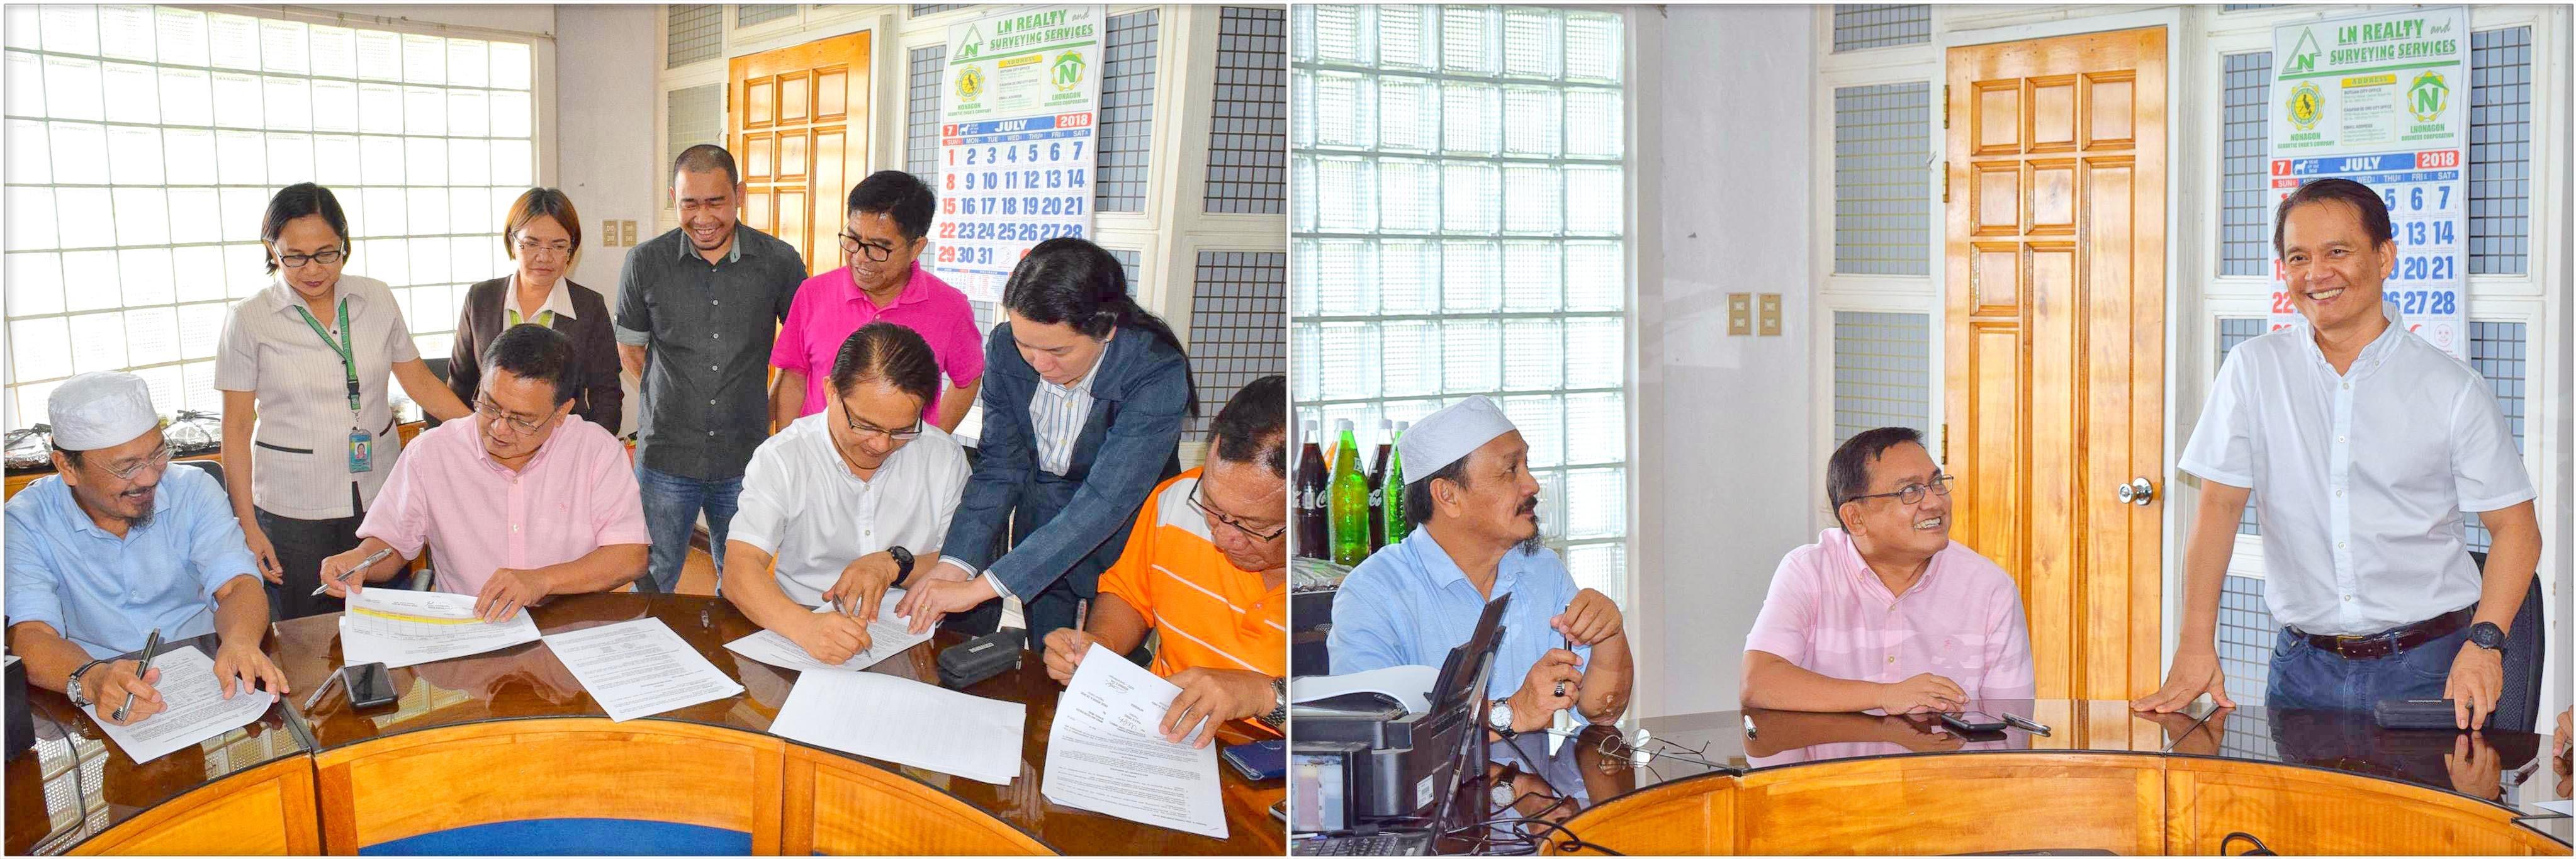 "DENR, MGB, Marcventures intensify rehab efforts through ""Adopt an NGP Site"" project"